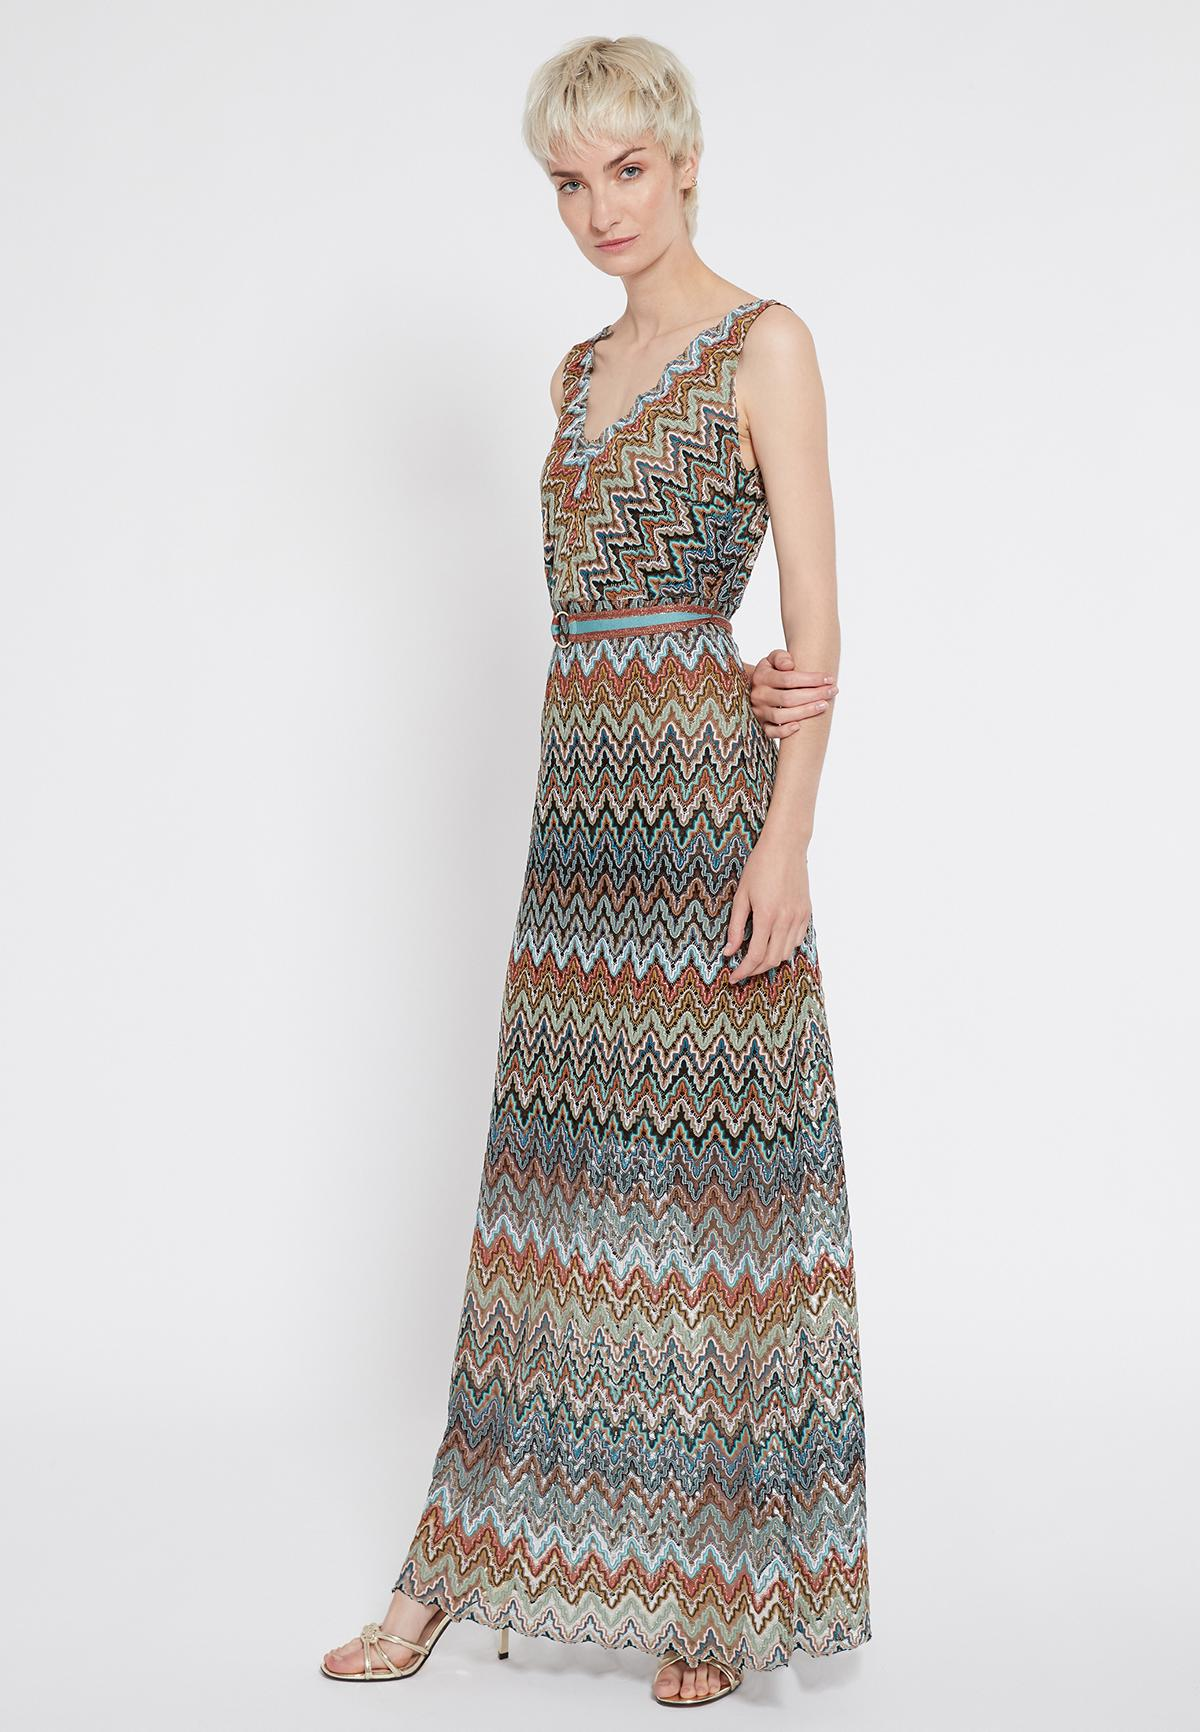 Front of Ana Alcazar Maxi Dress Sosinka  worn by model